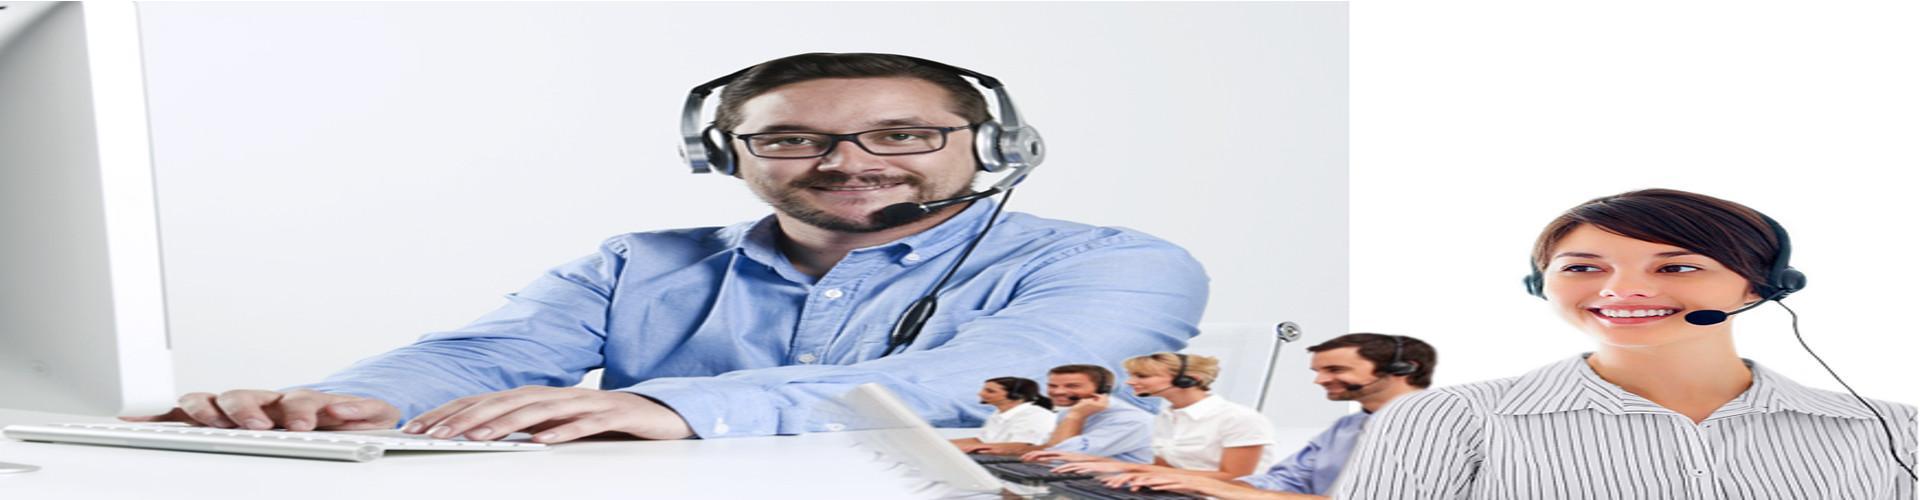 Fondo Soporte Online